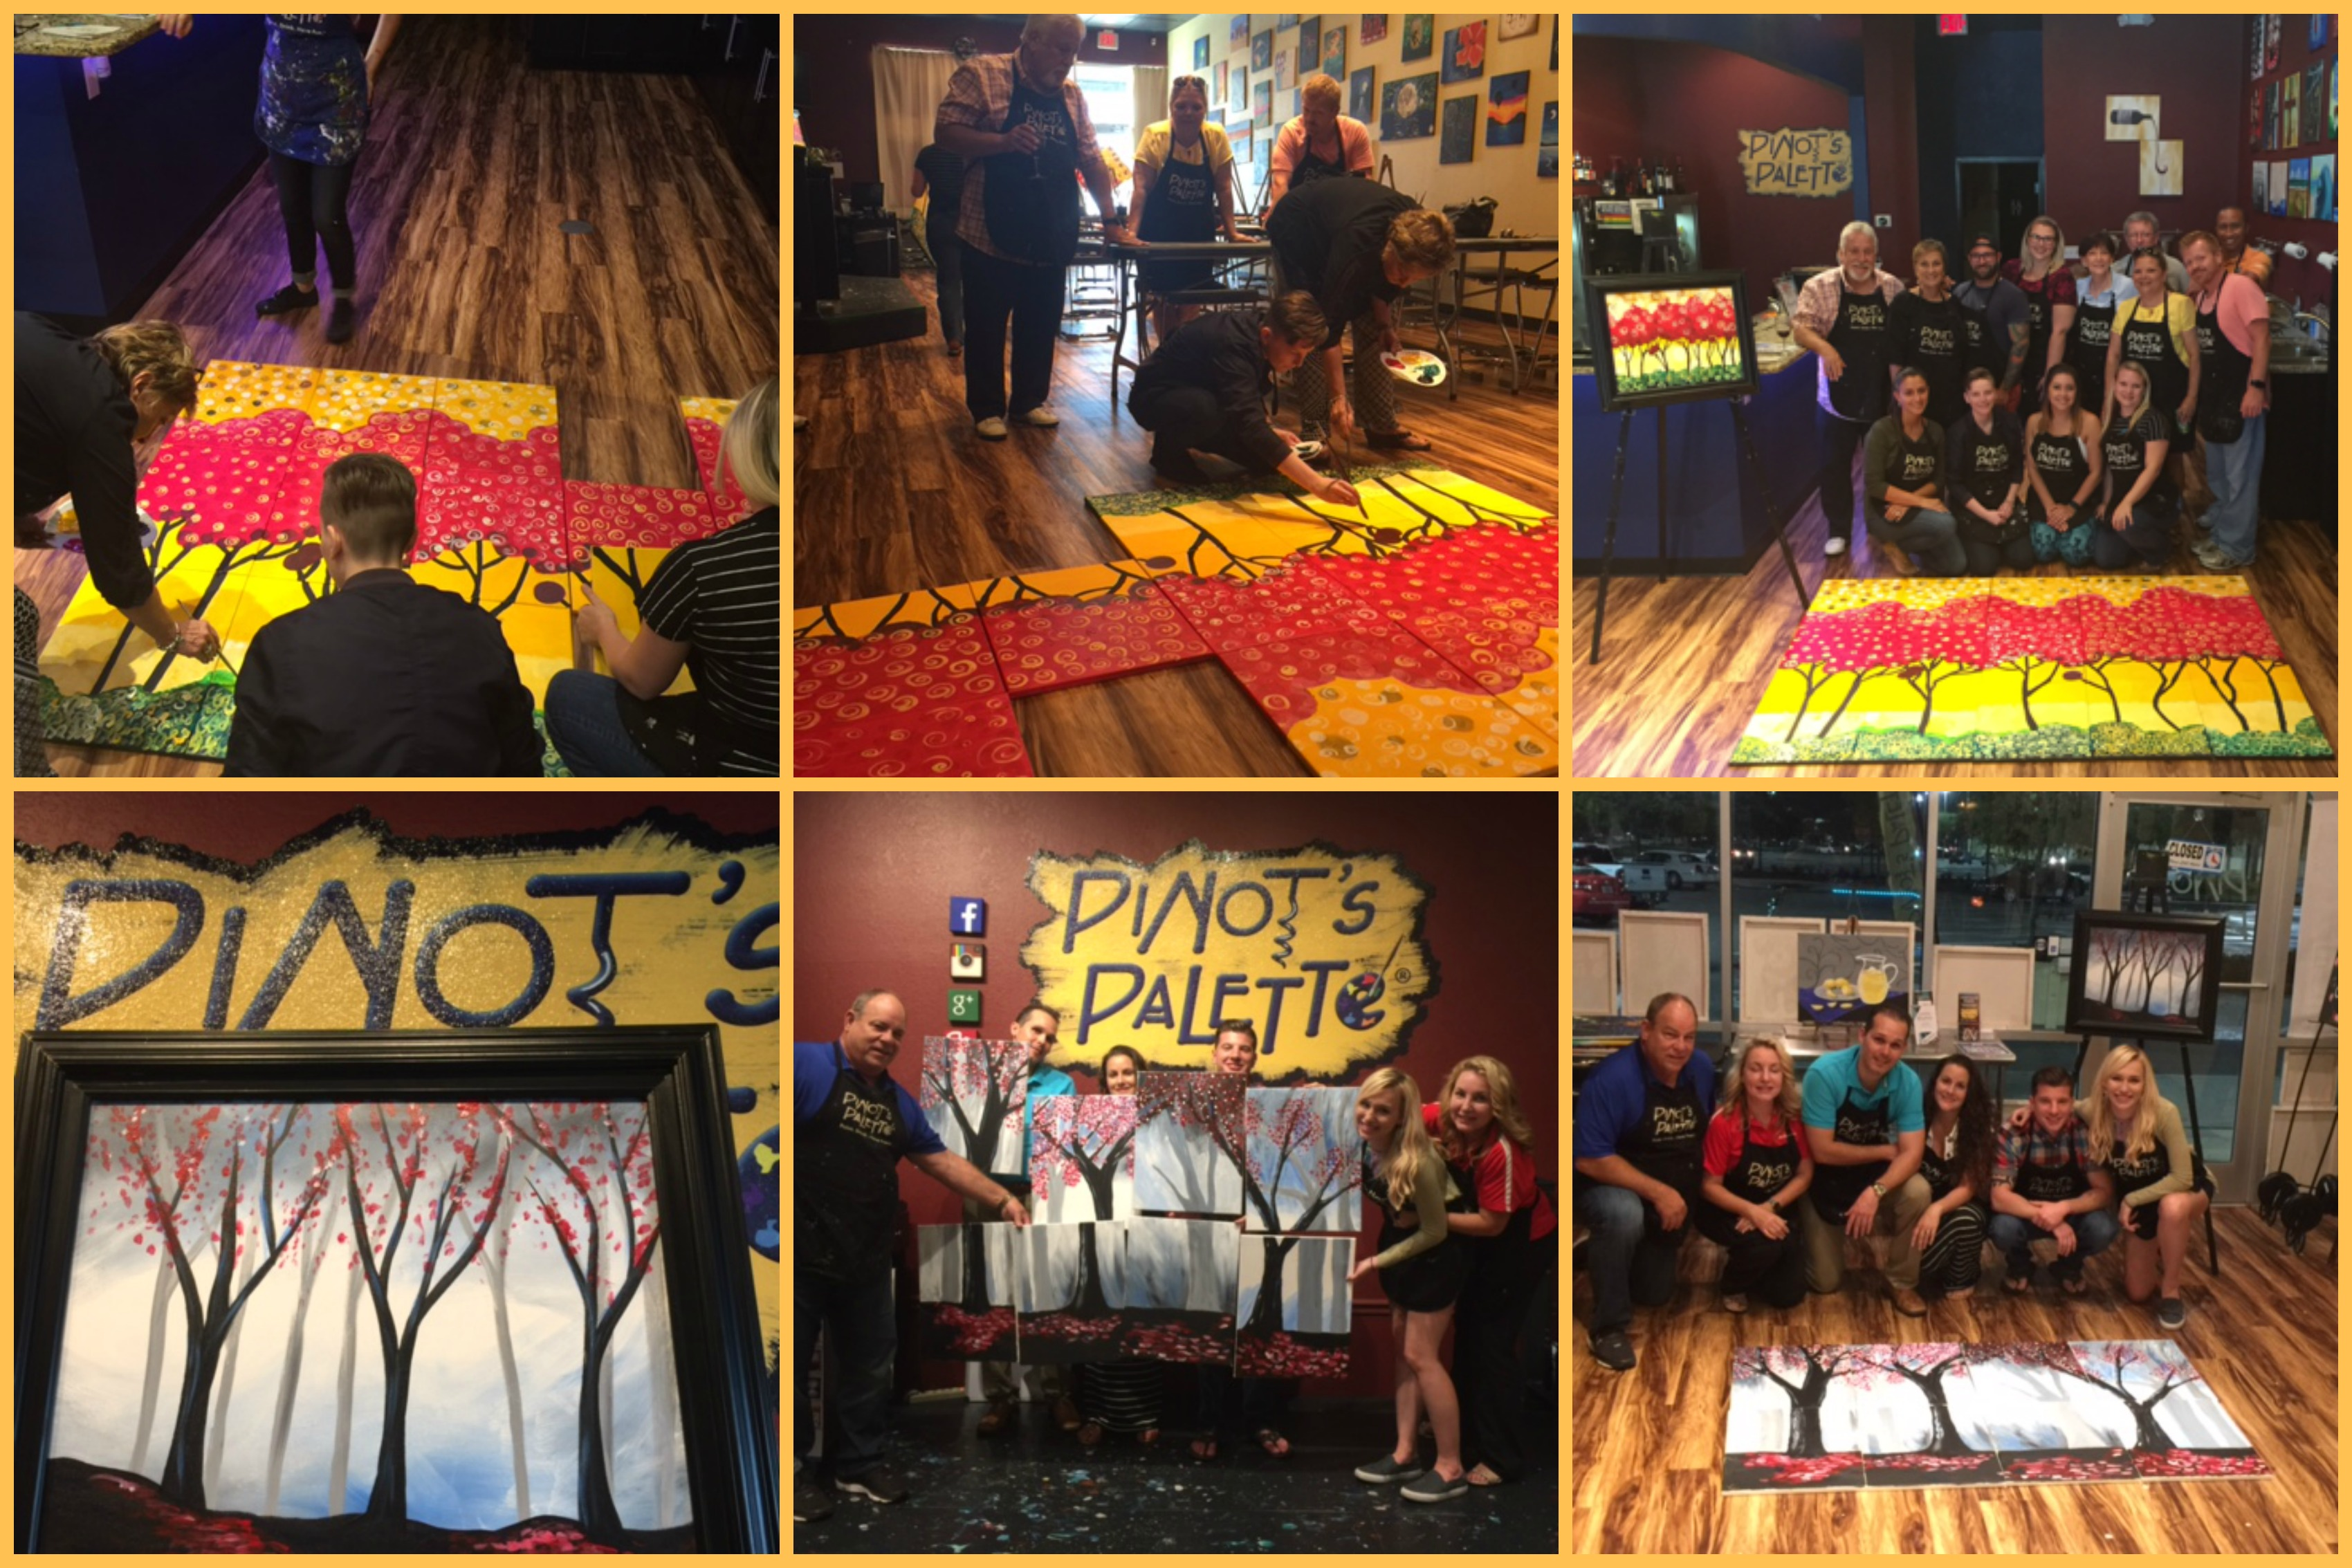 fun corporate team building ideas - pinot's palette